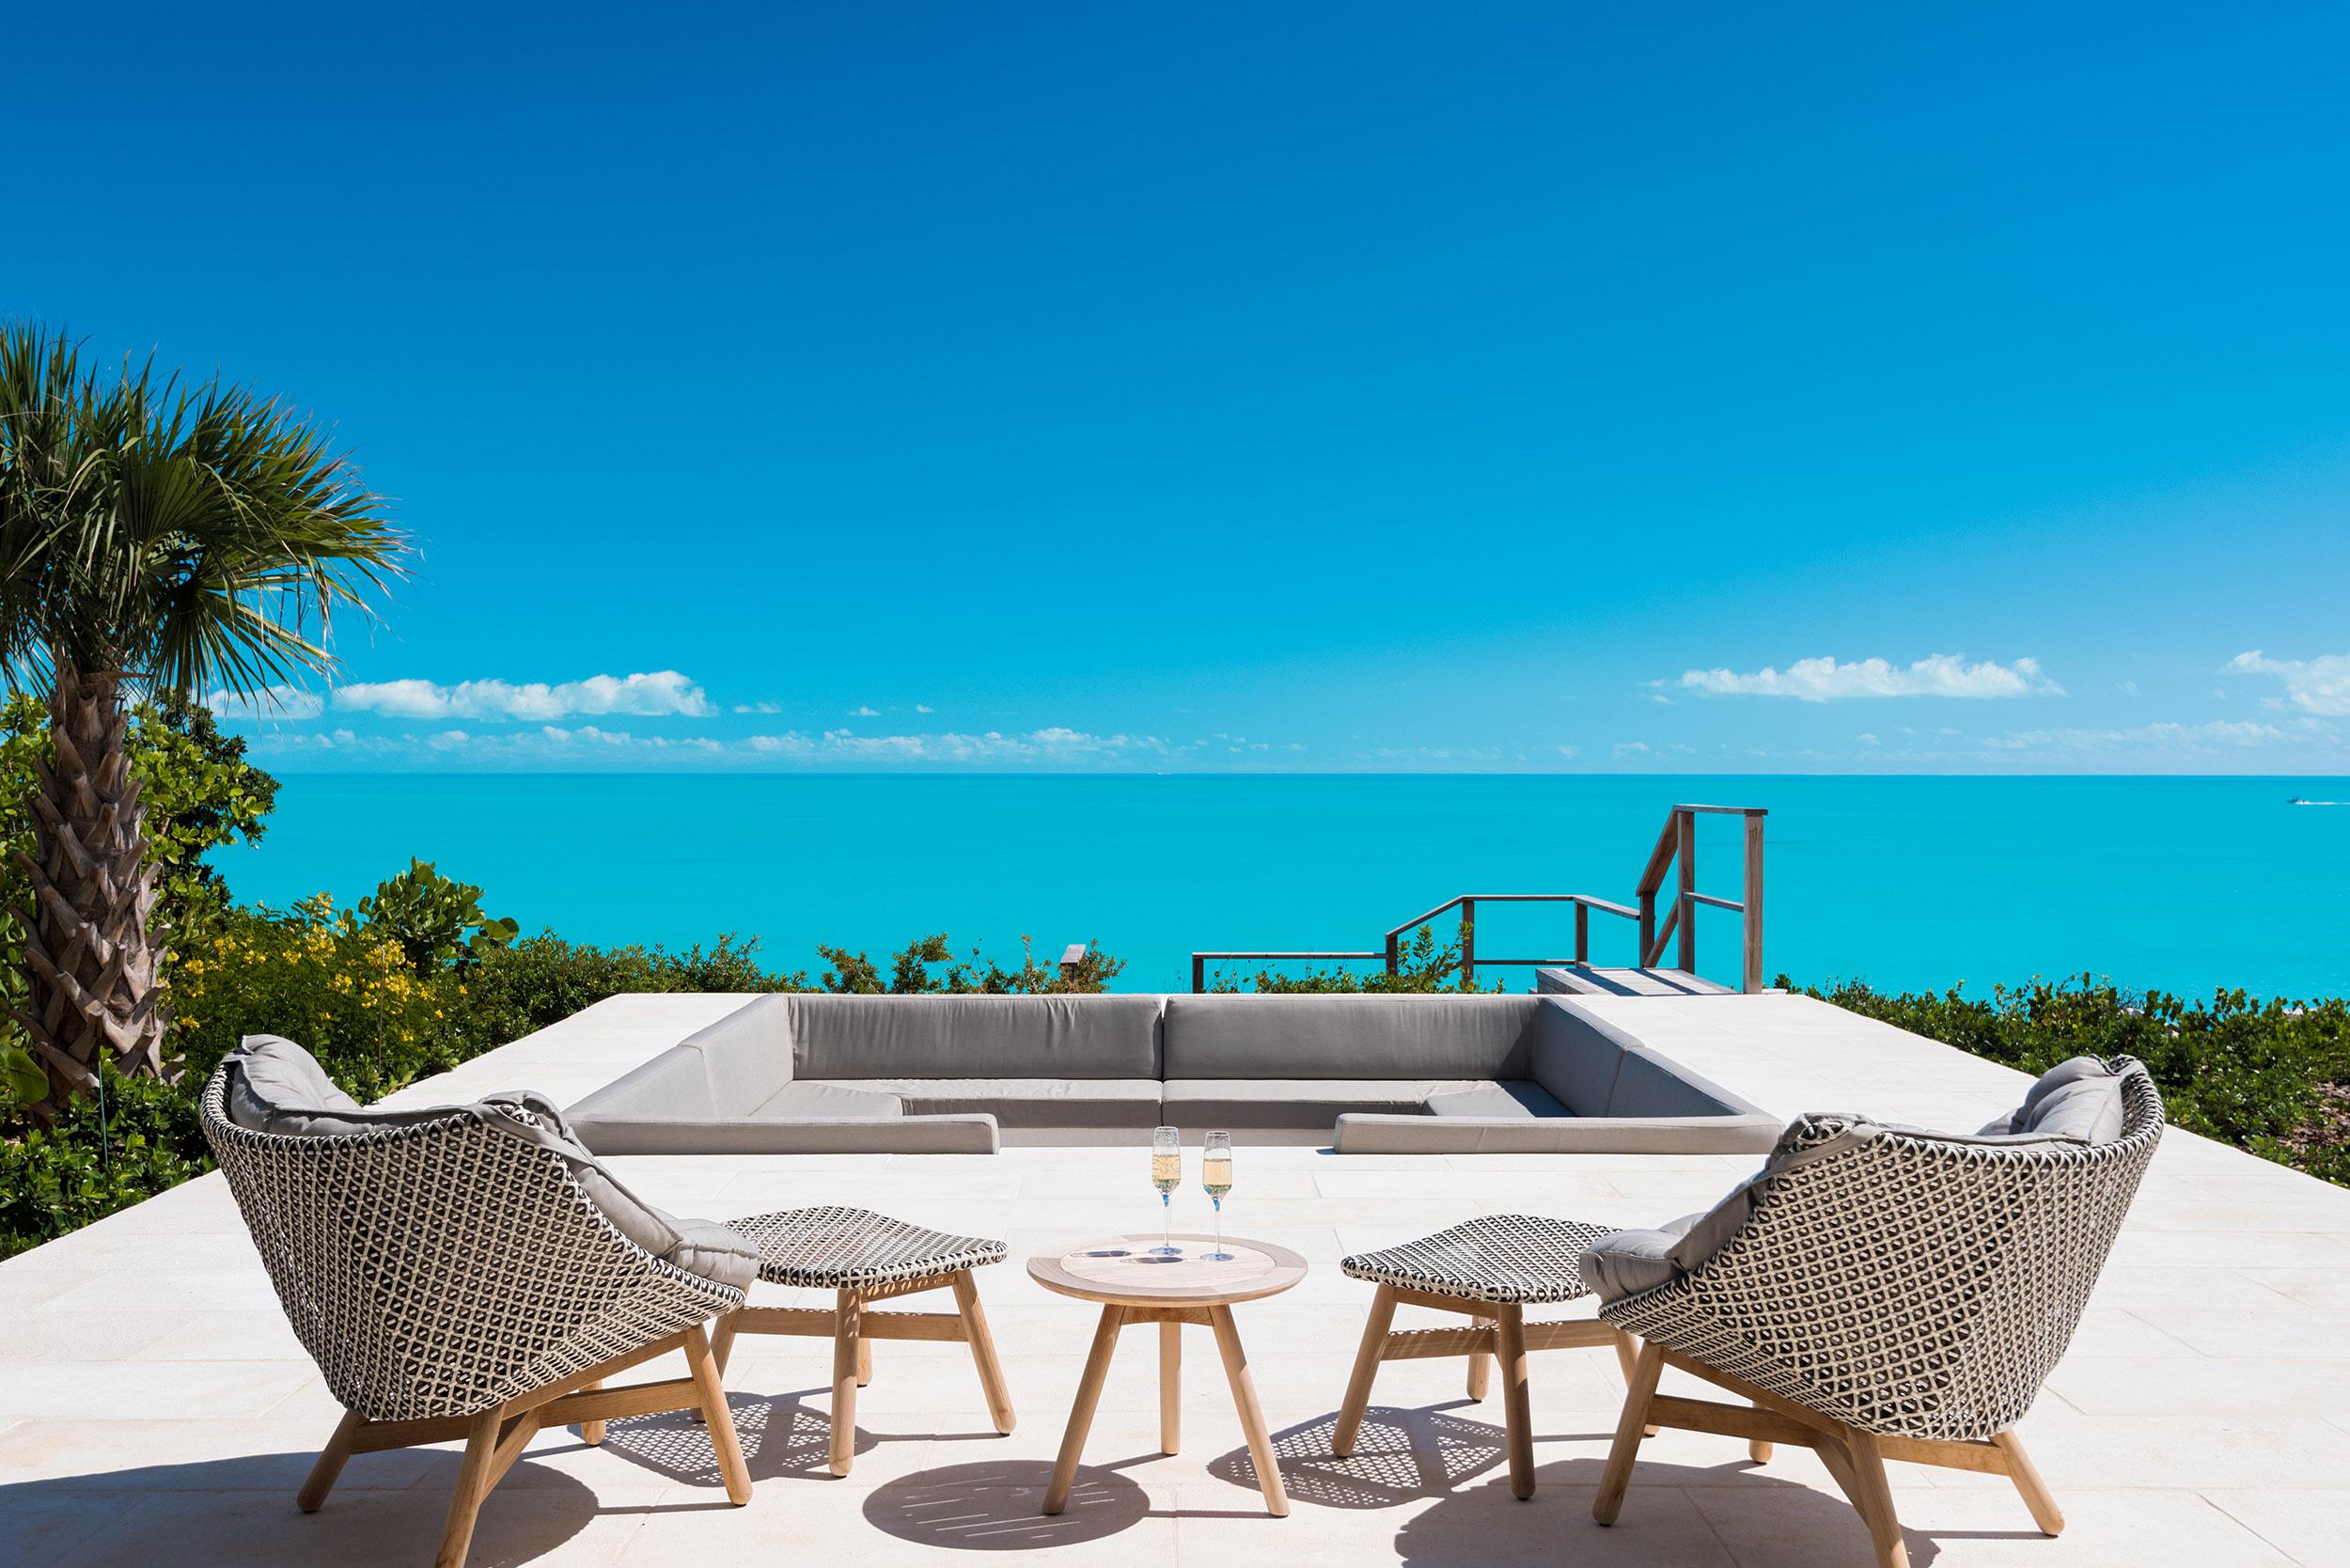 Wymara Villas - view from the terrace